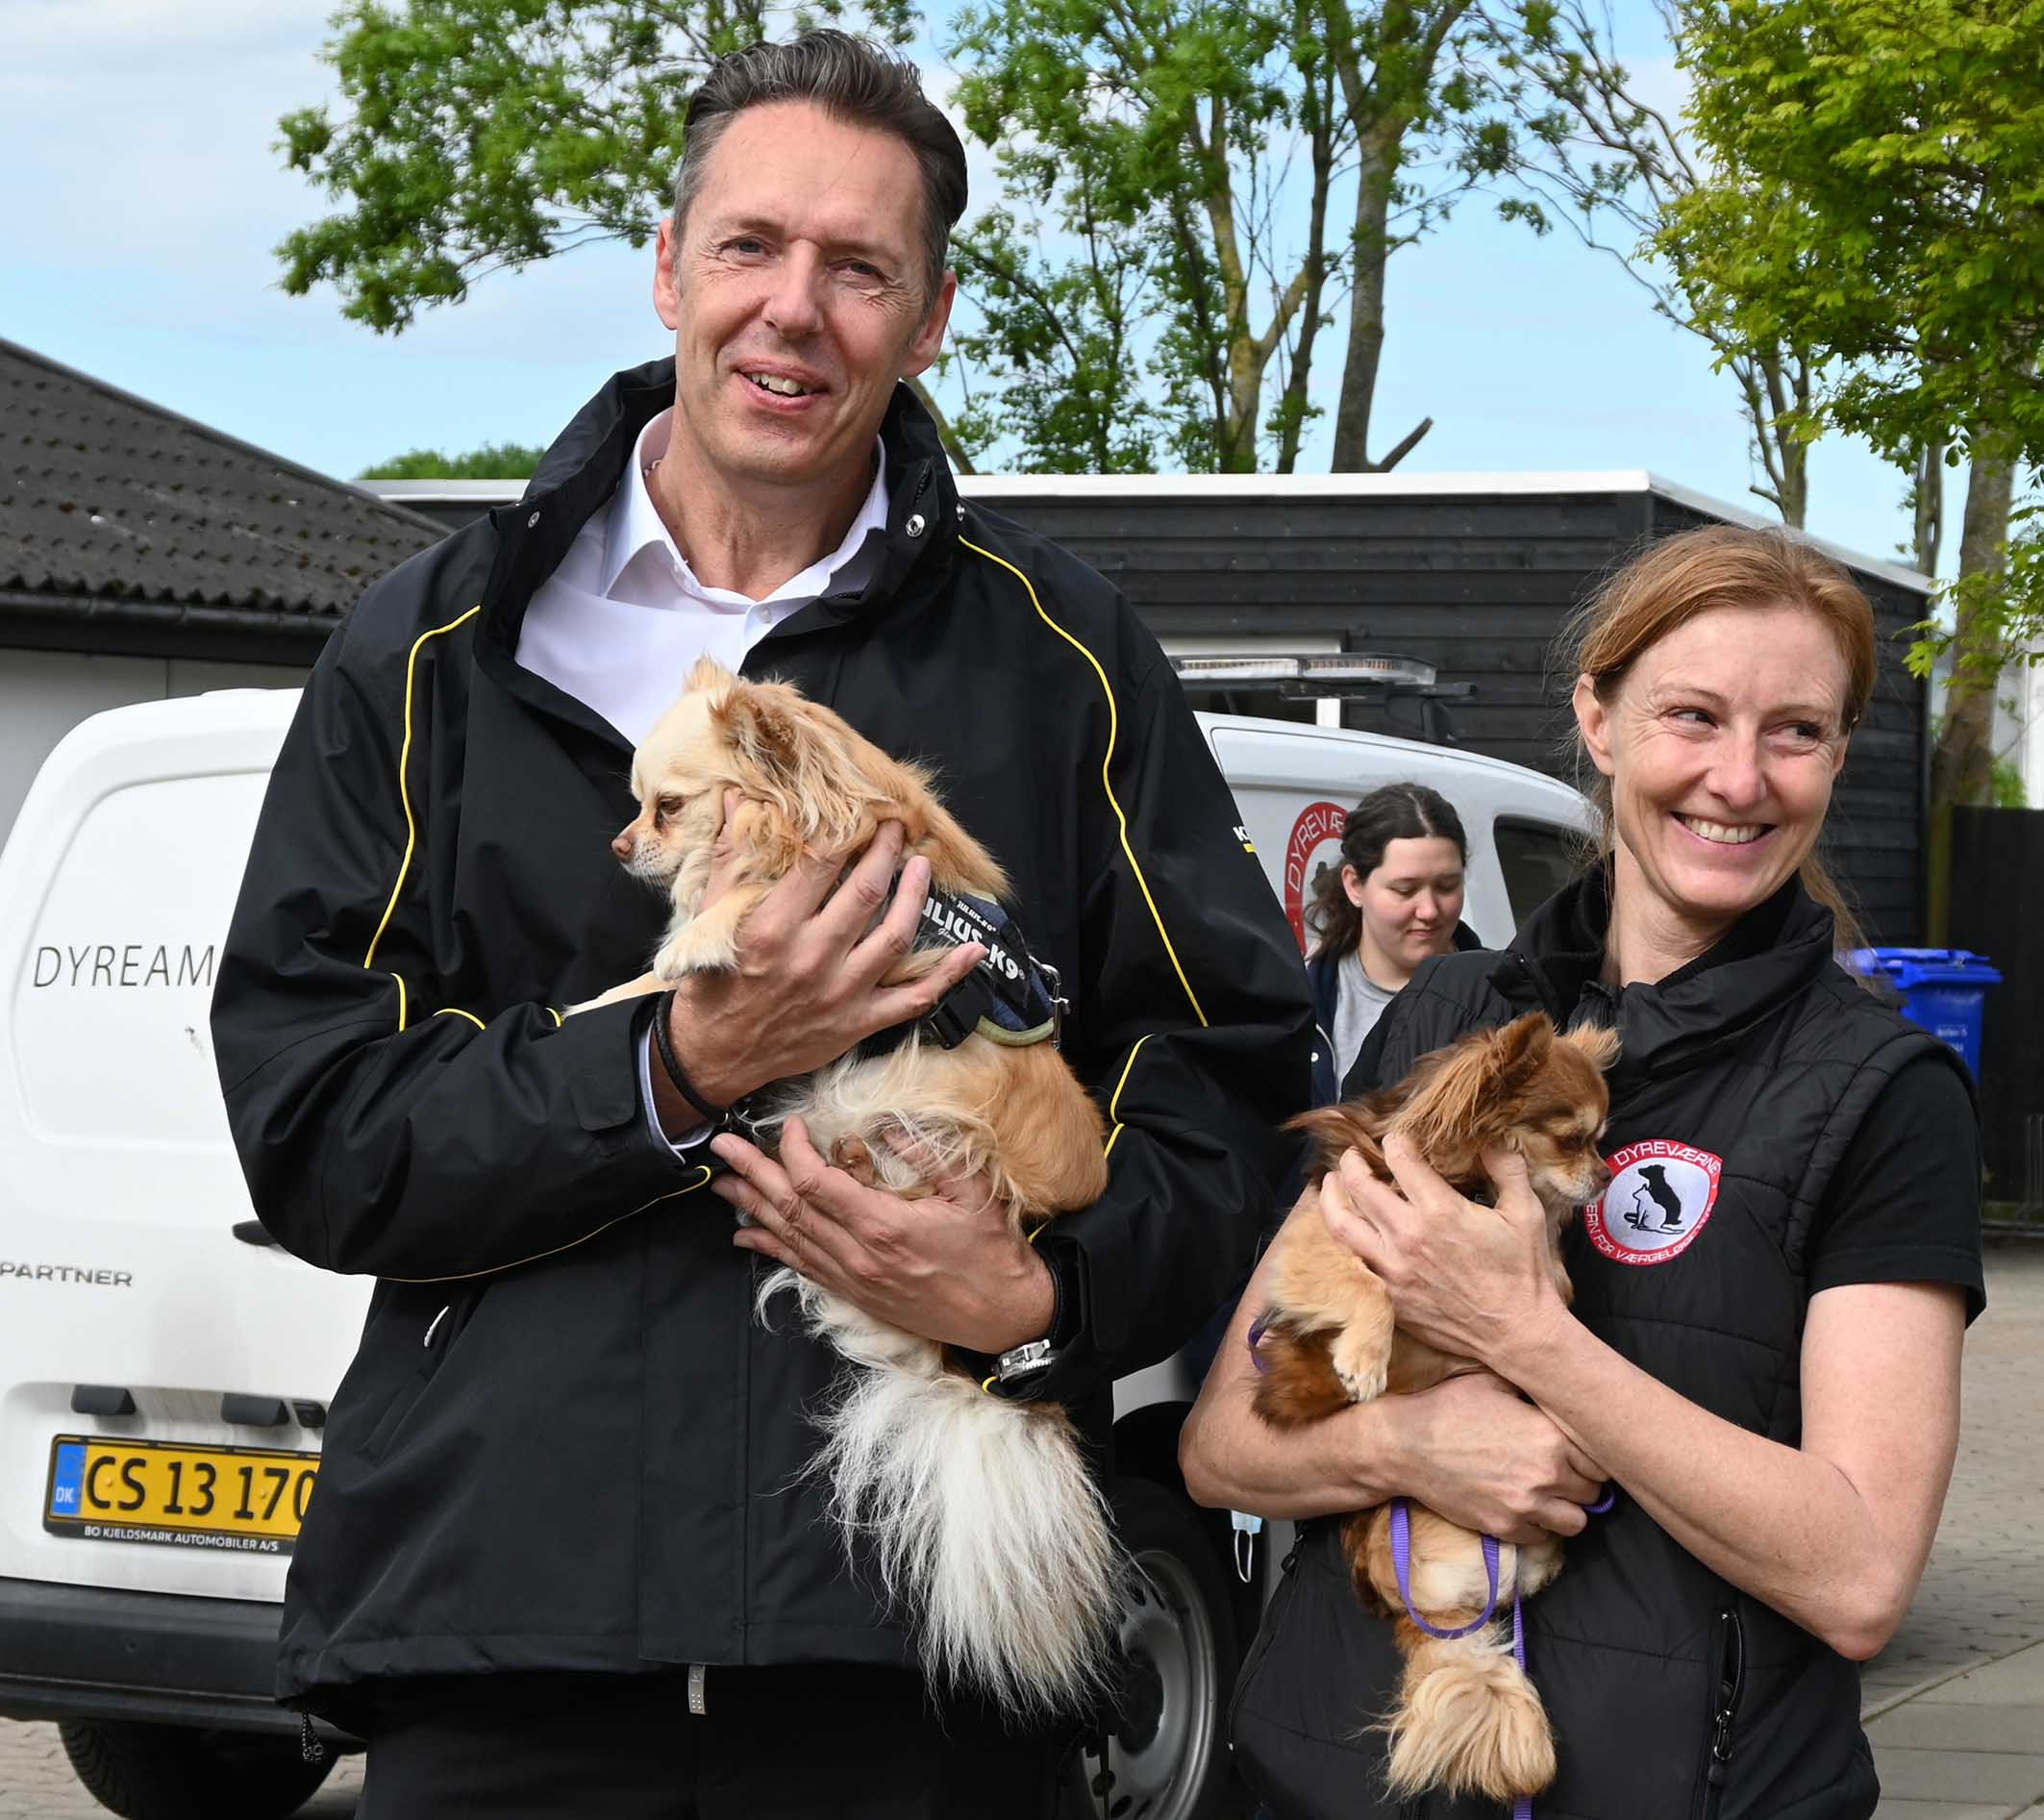 Hundene logrede – Deres hjem stod funklende rent!